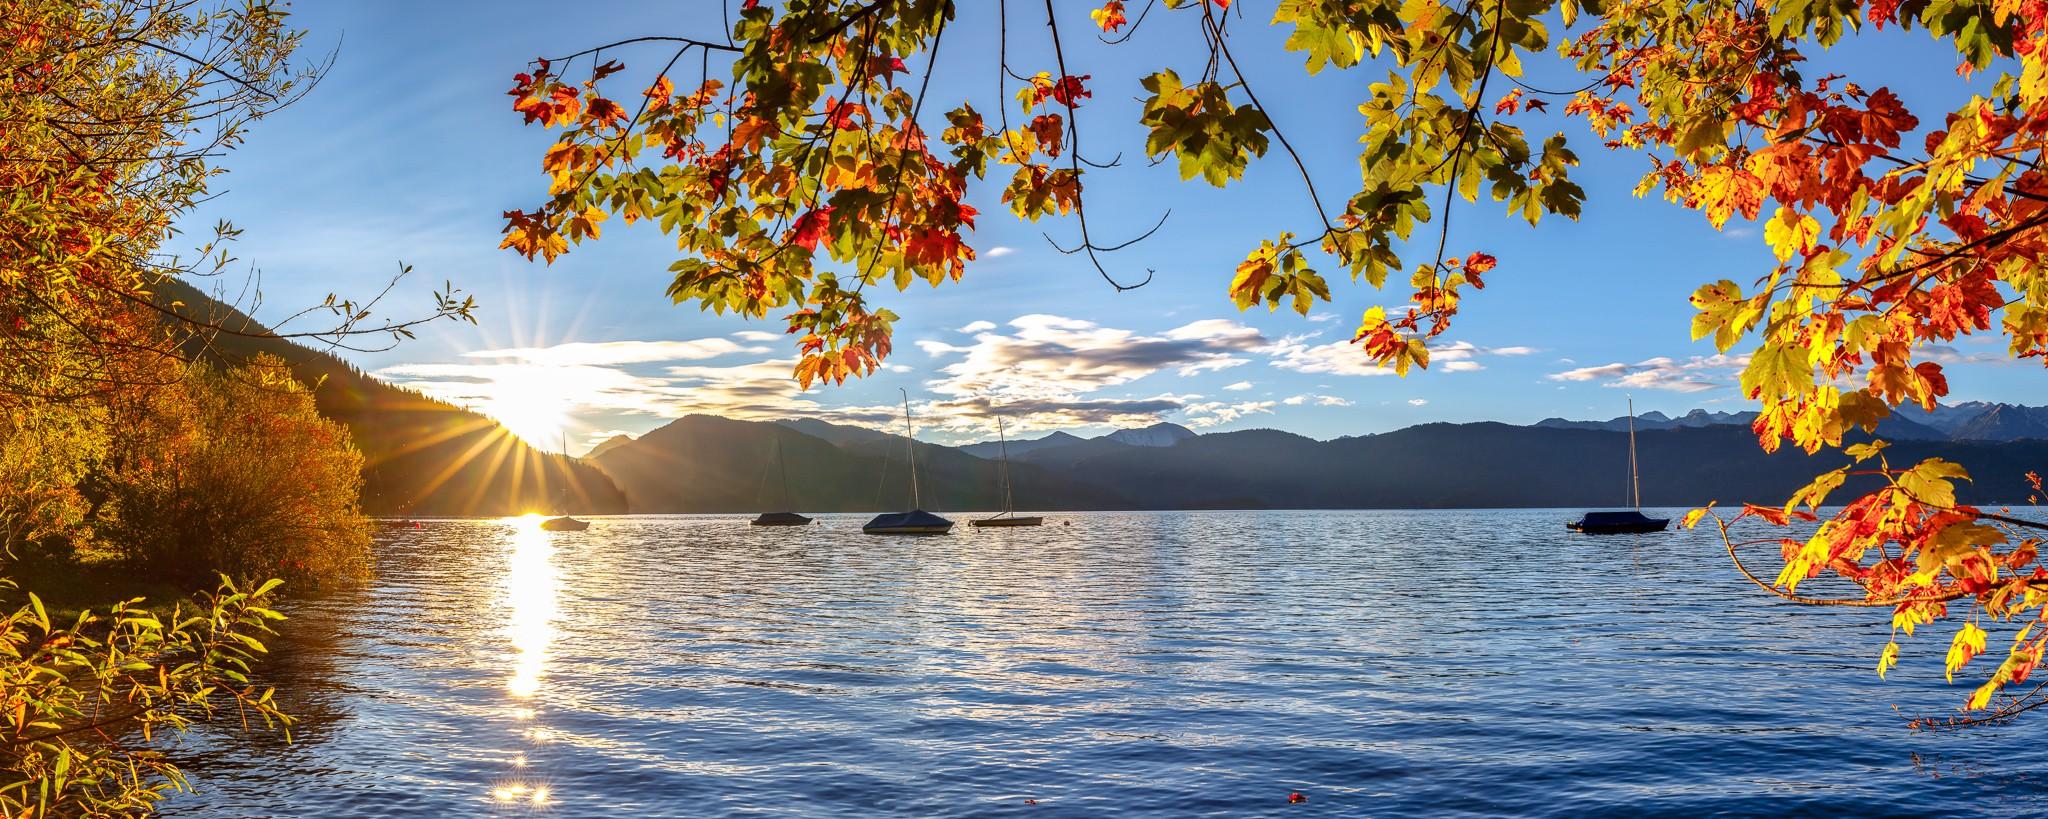 Sonnenaufgang am Walchensee - Herbst